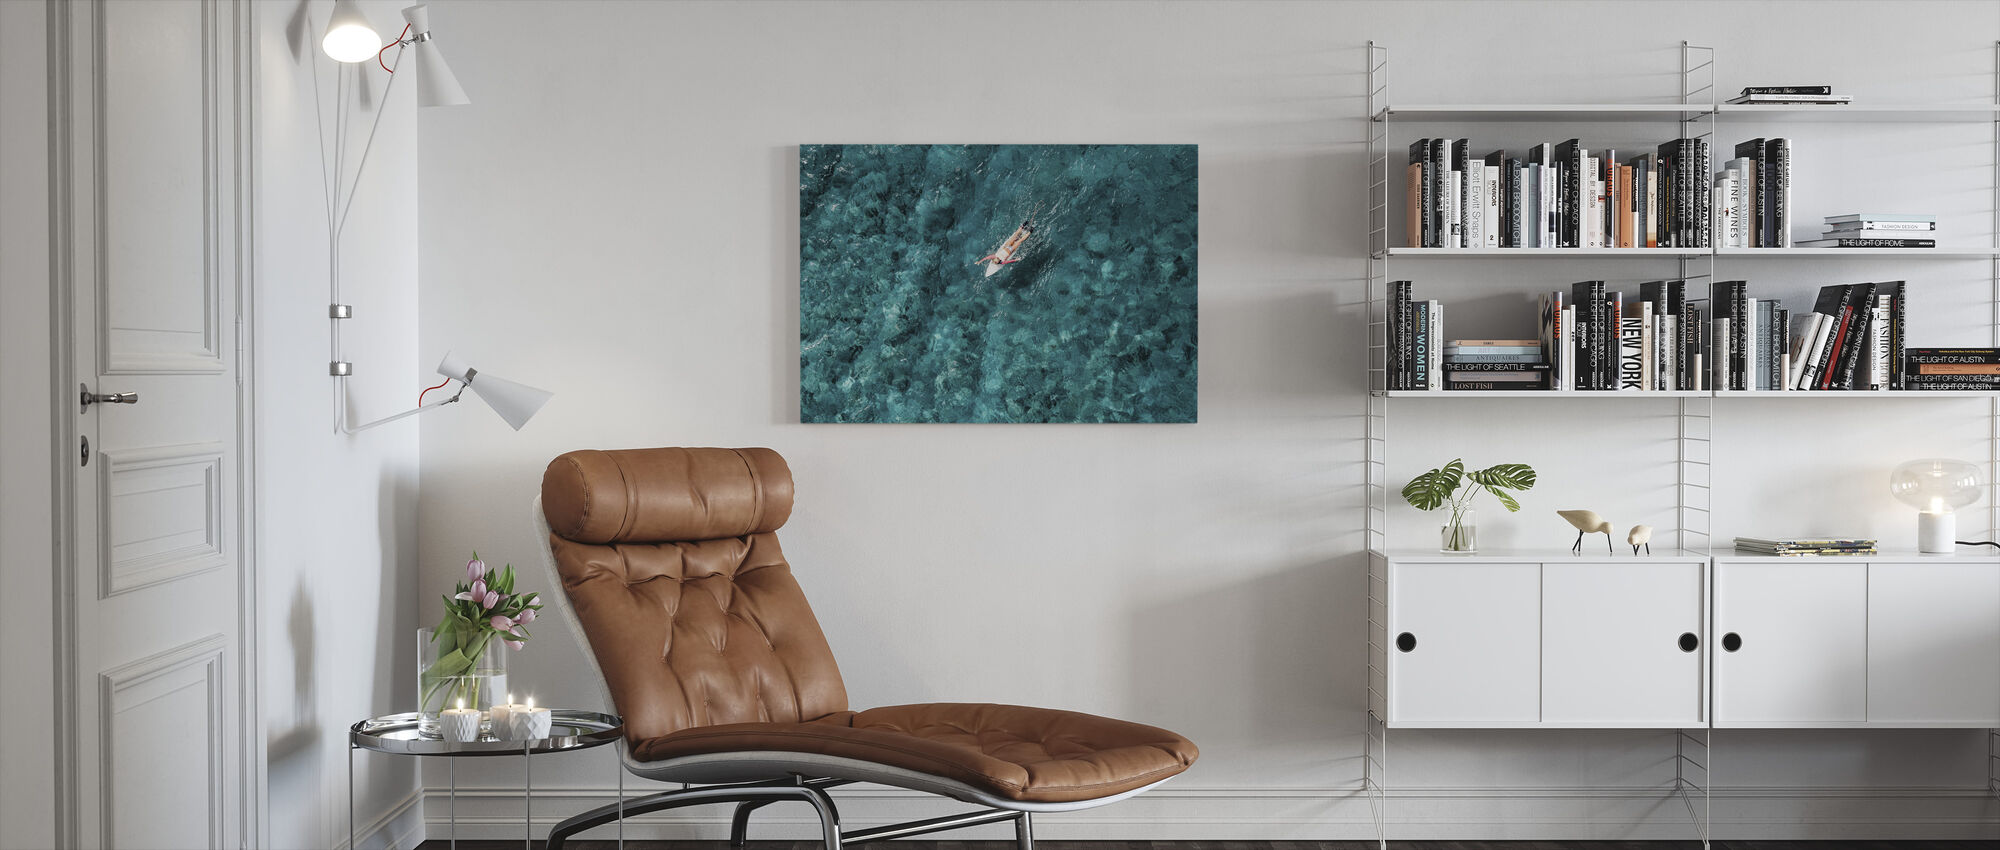 Surf peddelen in de zee - Canvas print - Woonkamer